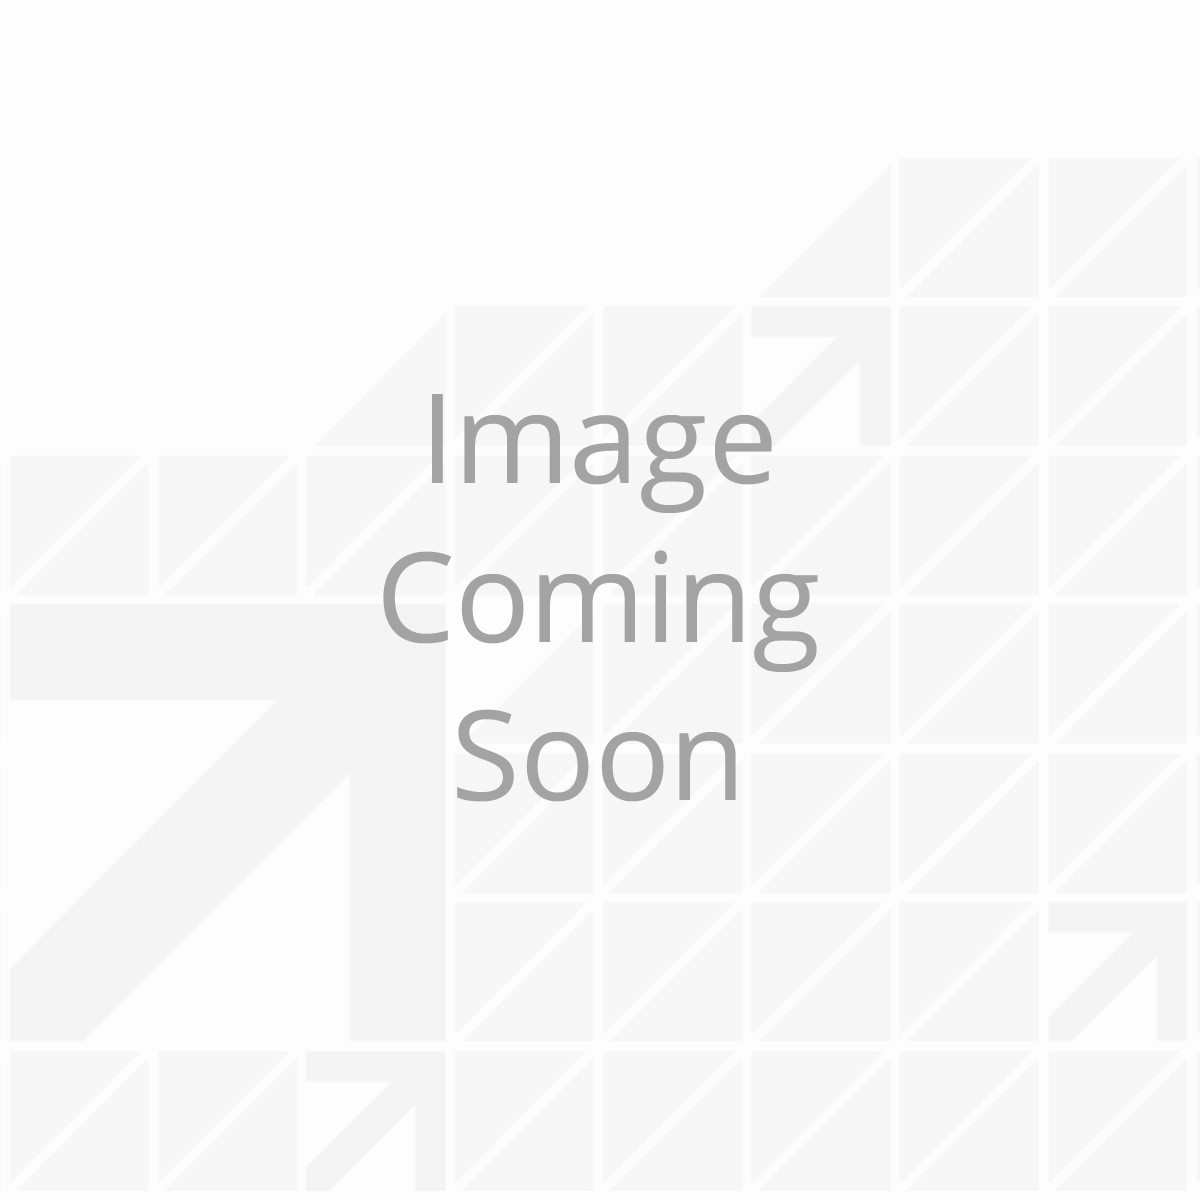 4 Room Manifold/Valve W/O Plate